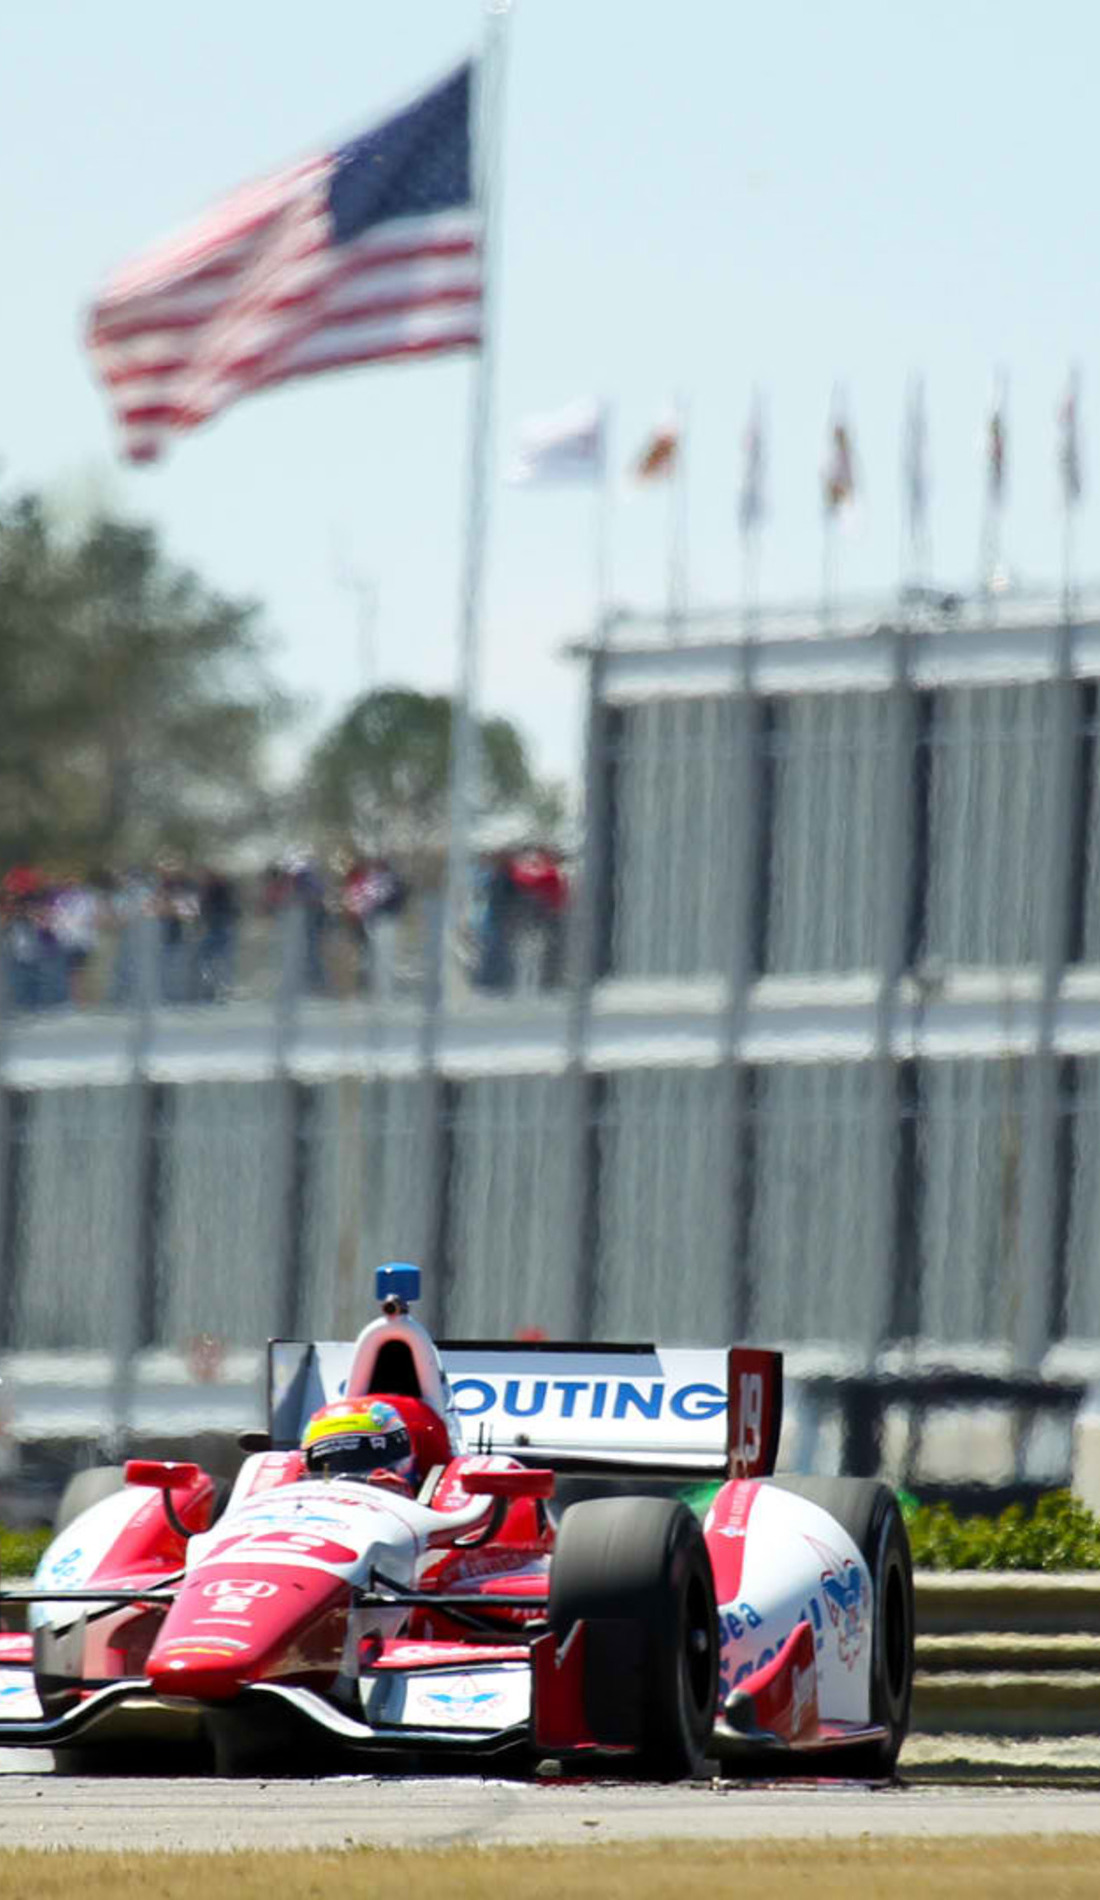 A Indianapolis Grand Prix live event